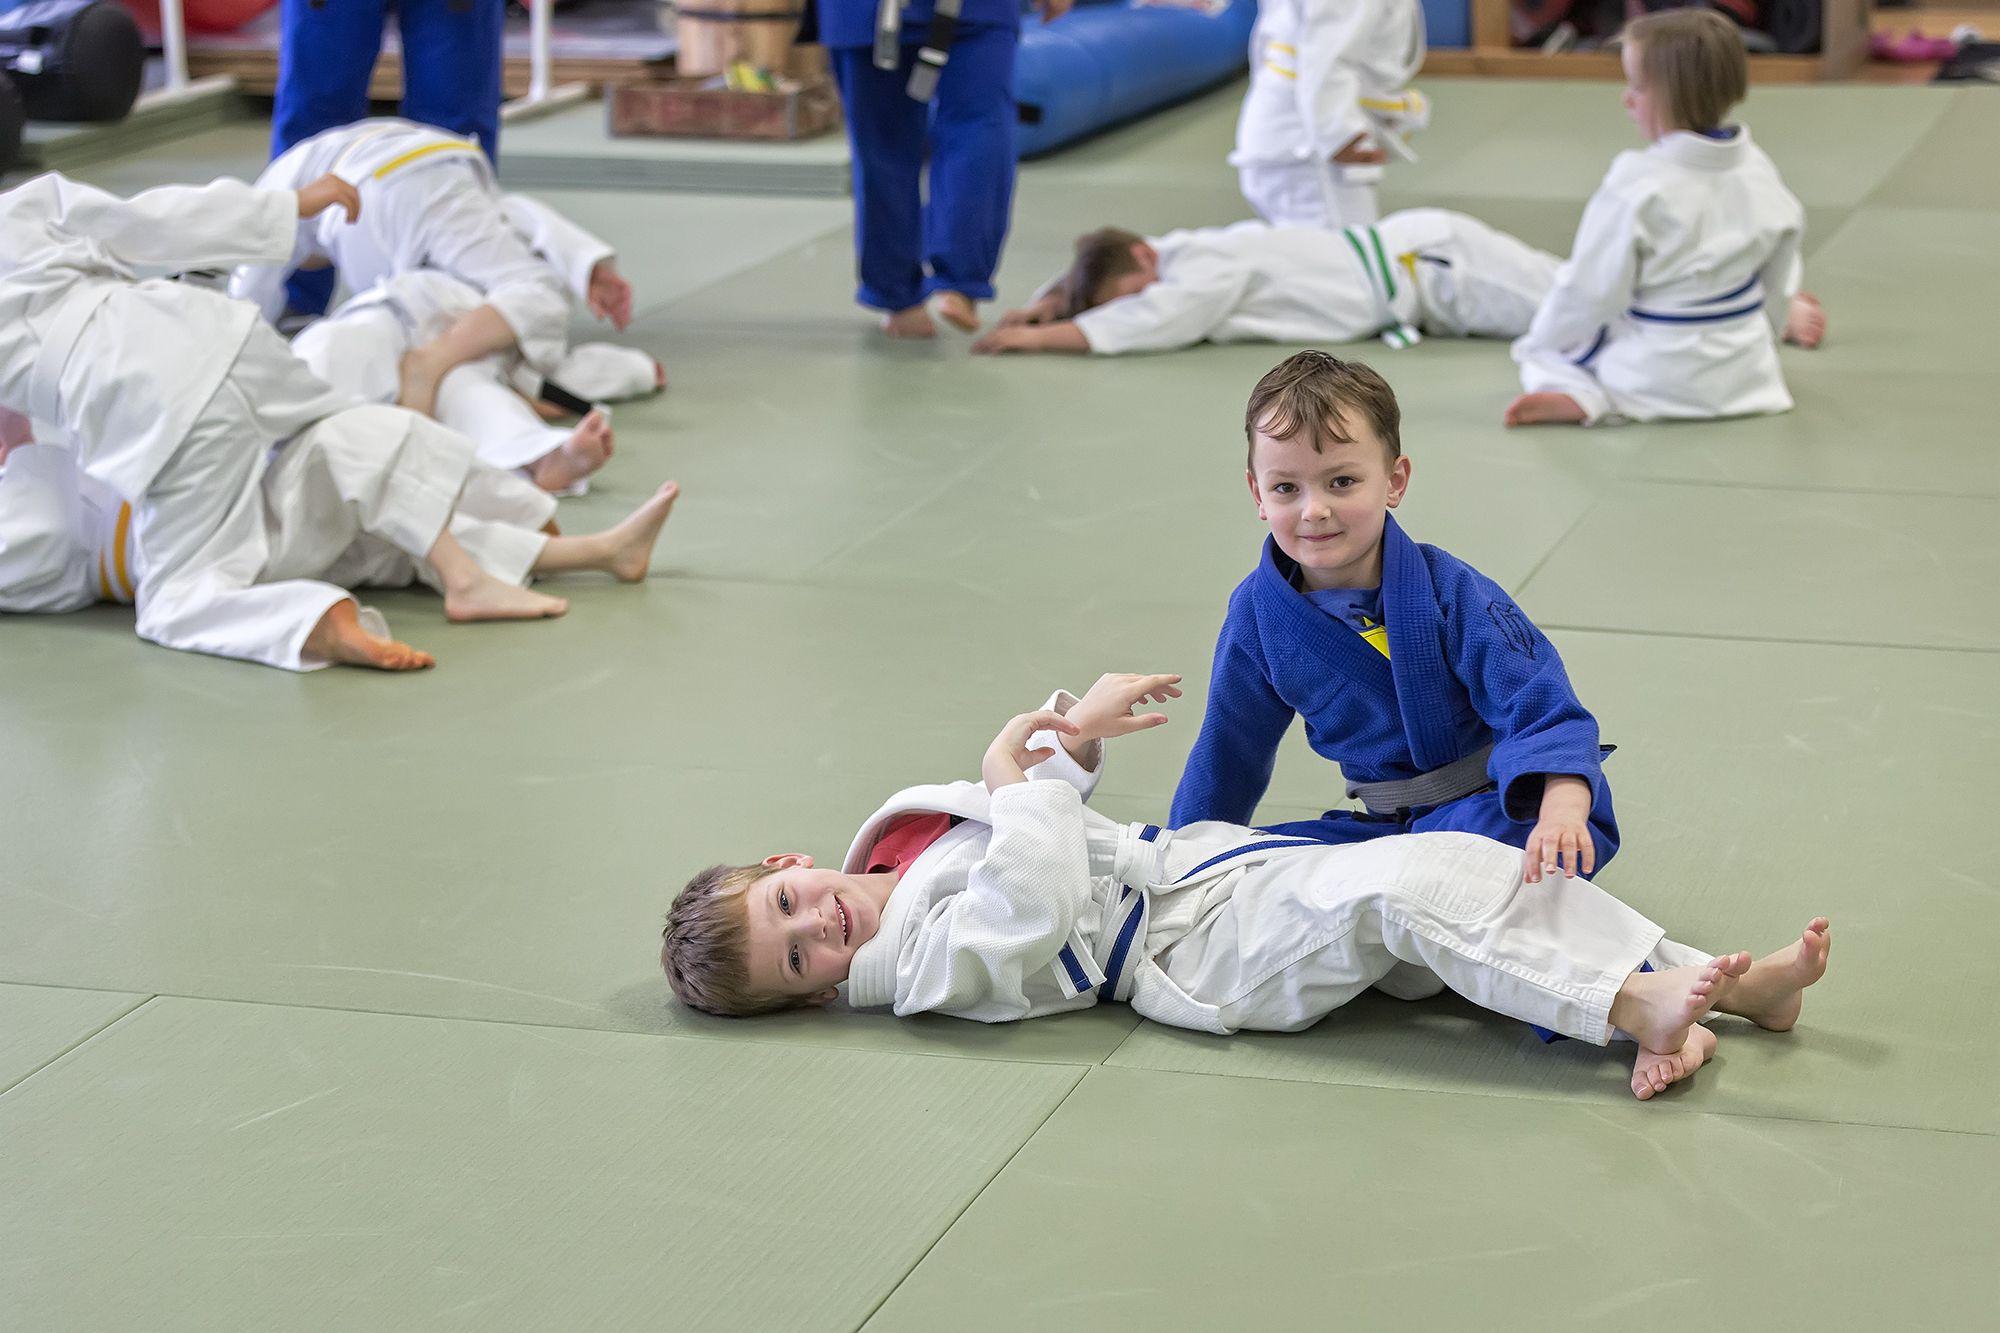 Kids who train brazilian jiu jitsu at revolution mma in